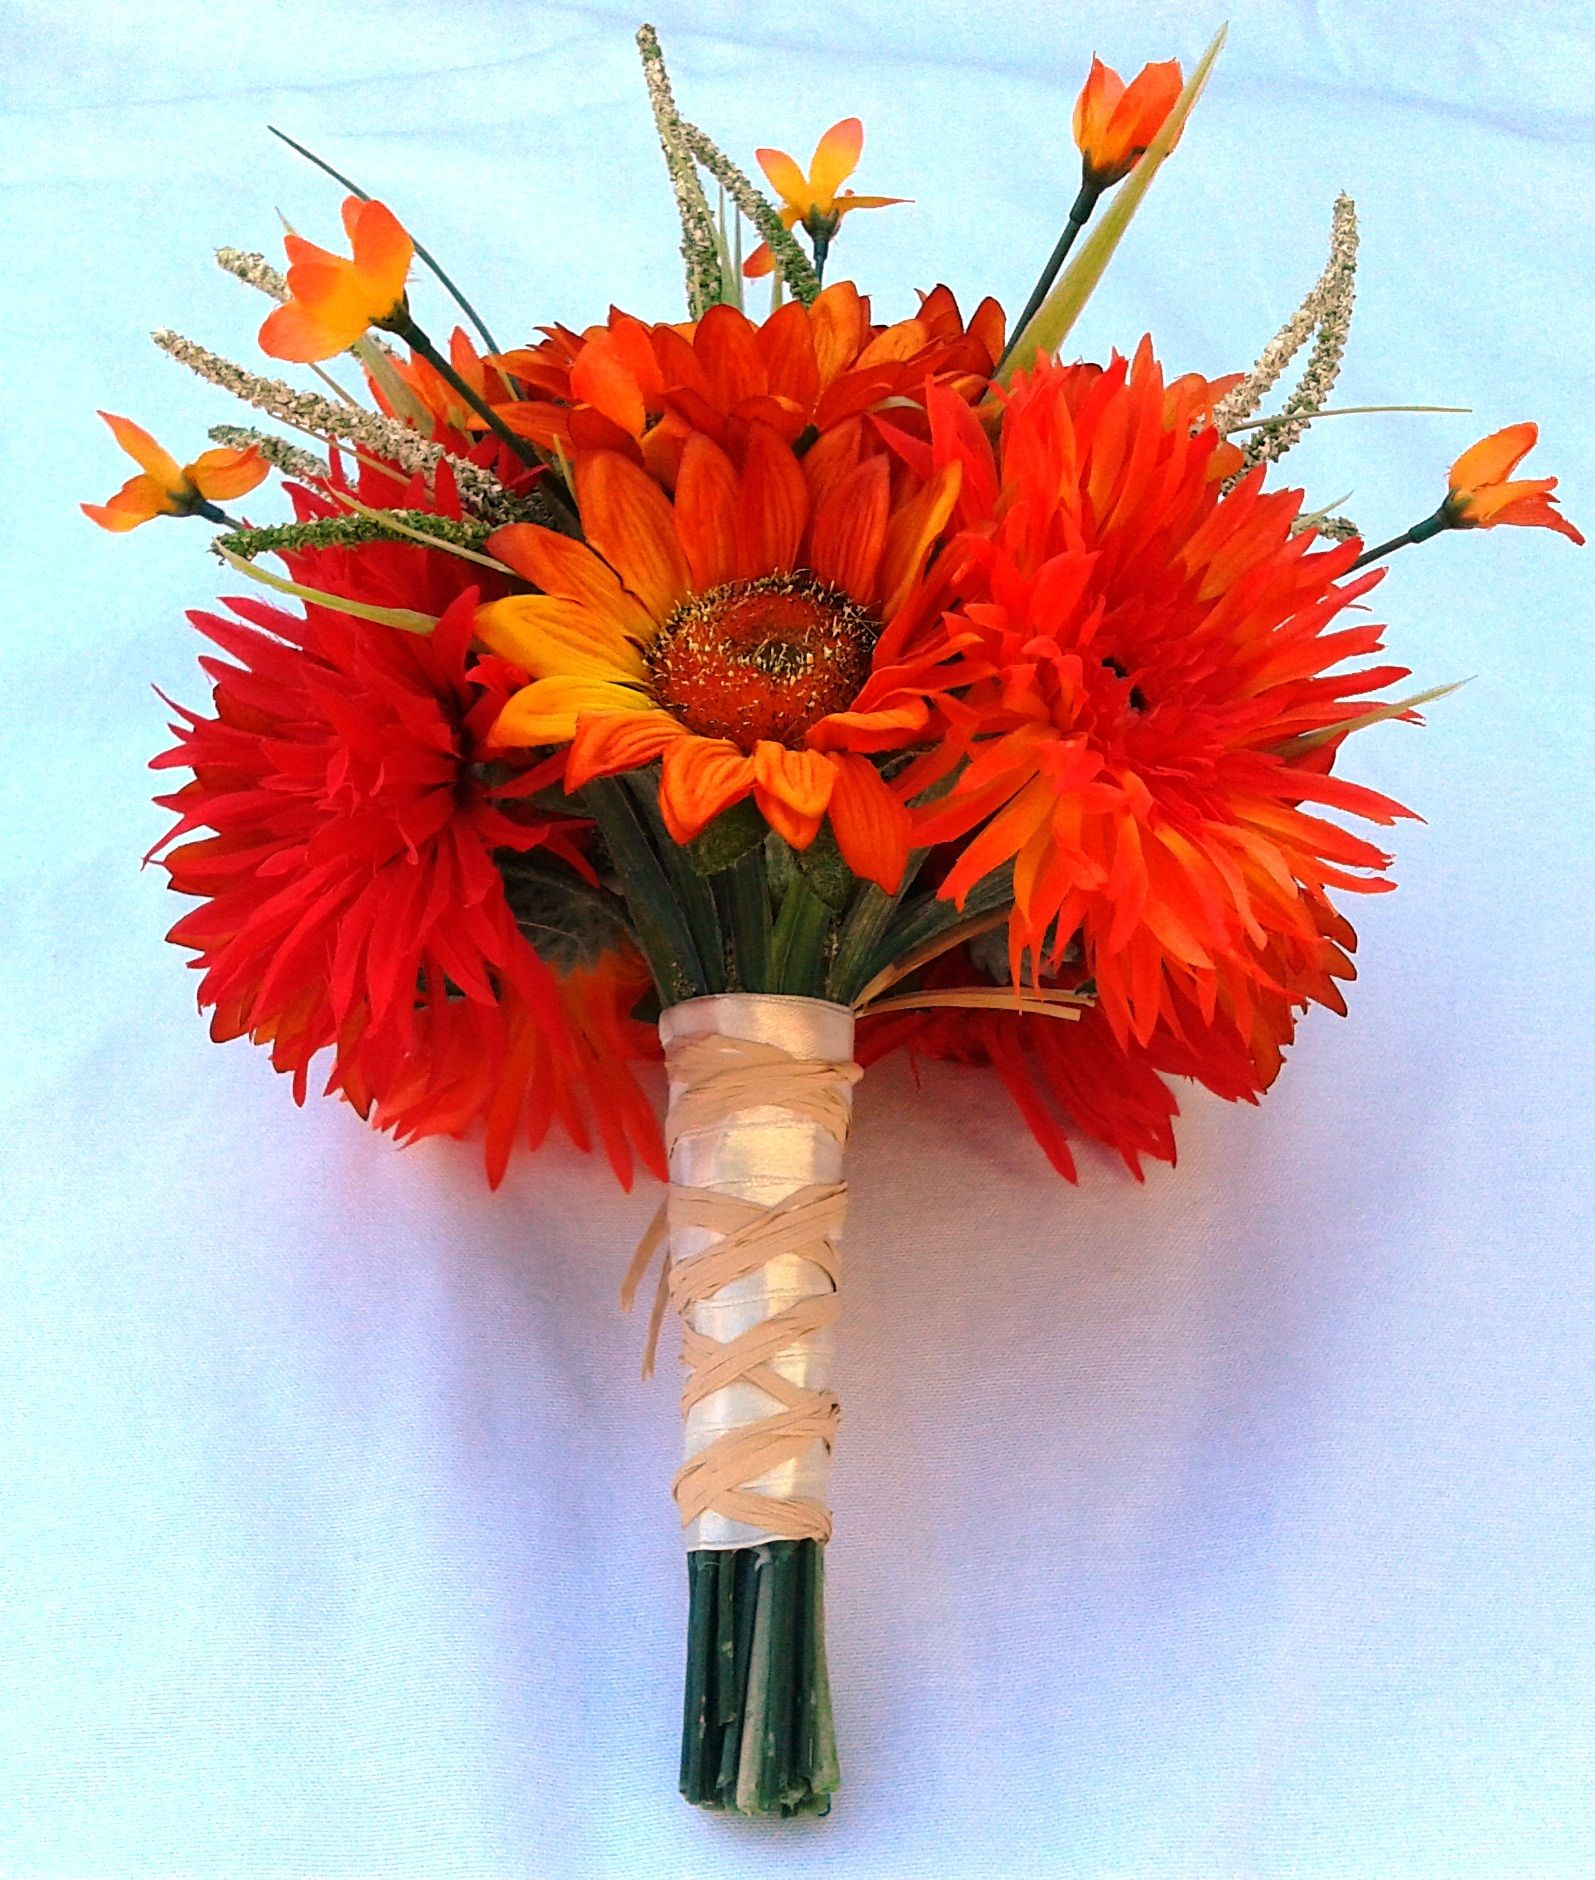 Orange Flower Arrangements For Weddings: Bespoke Burnt Orange Bridal Bouquet